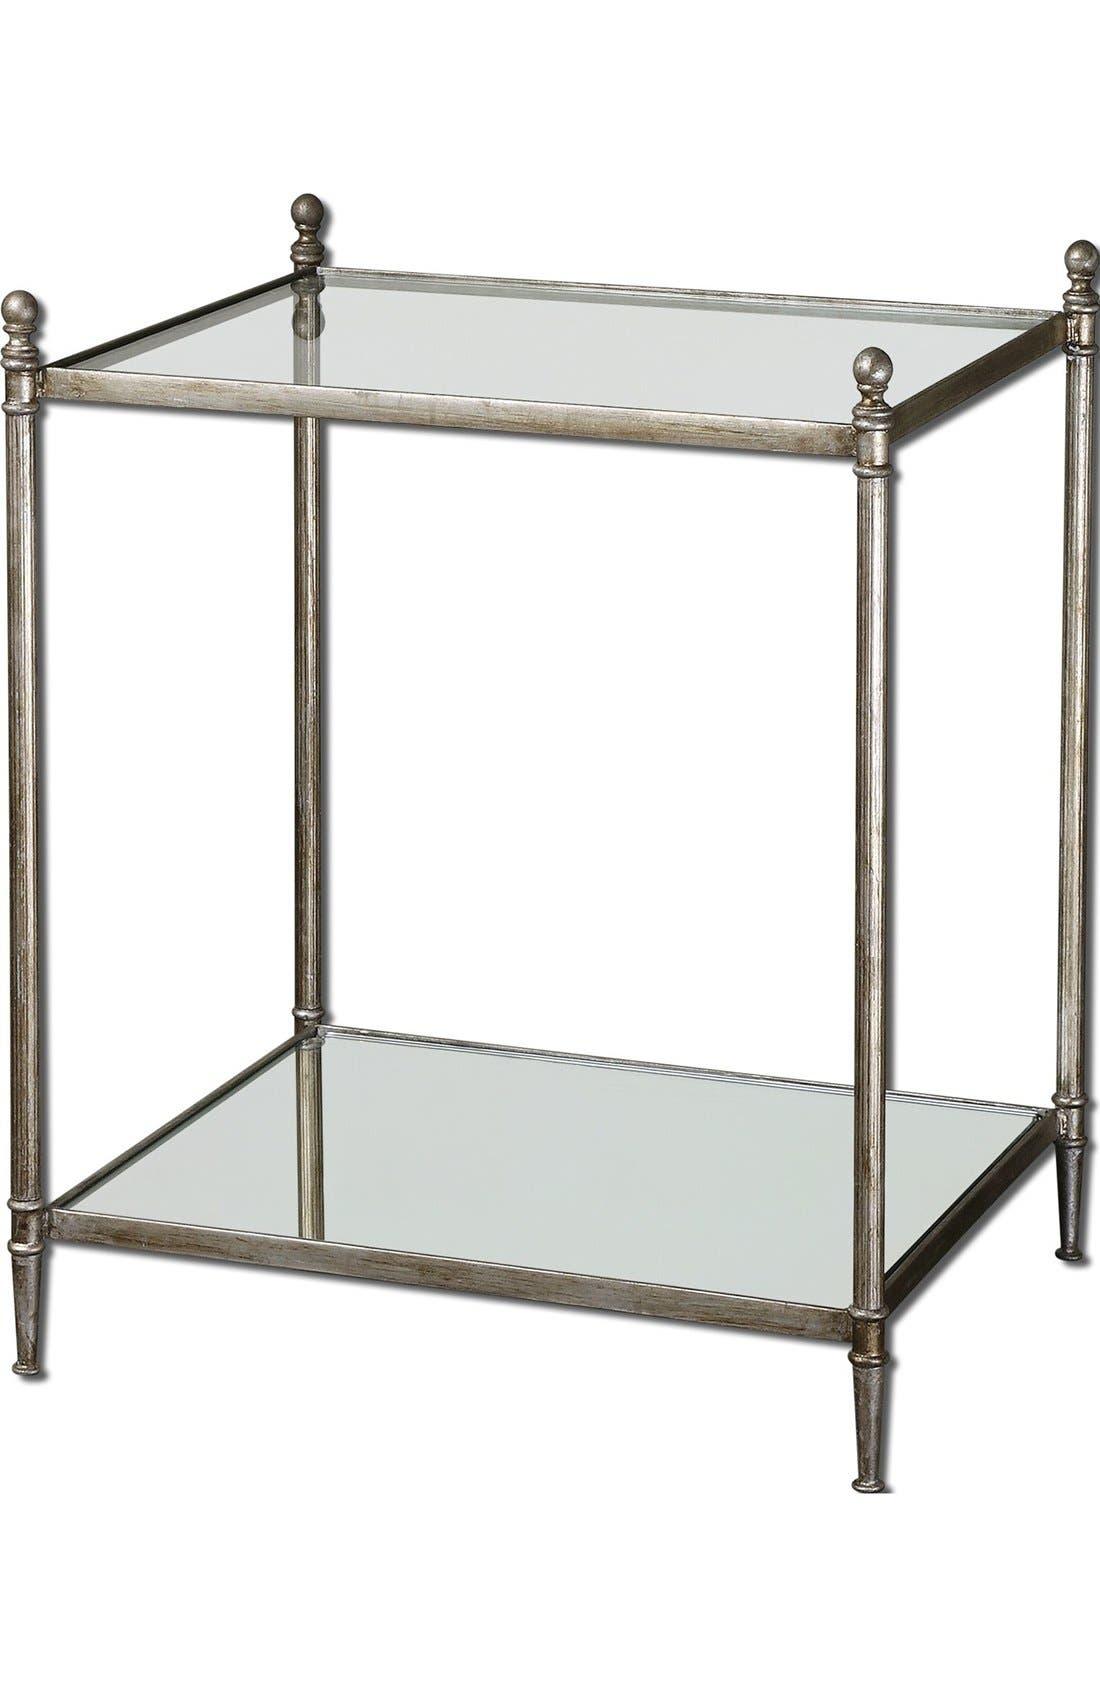 Alternate Image 1 Selected - Uttermost 'Gannon' Antiqued End Table